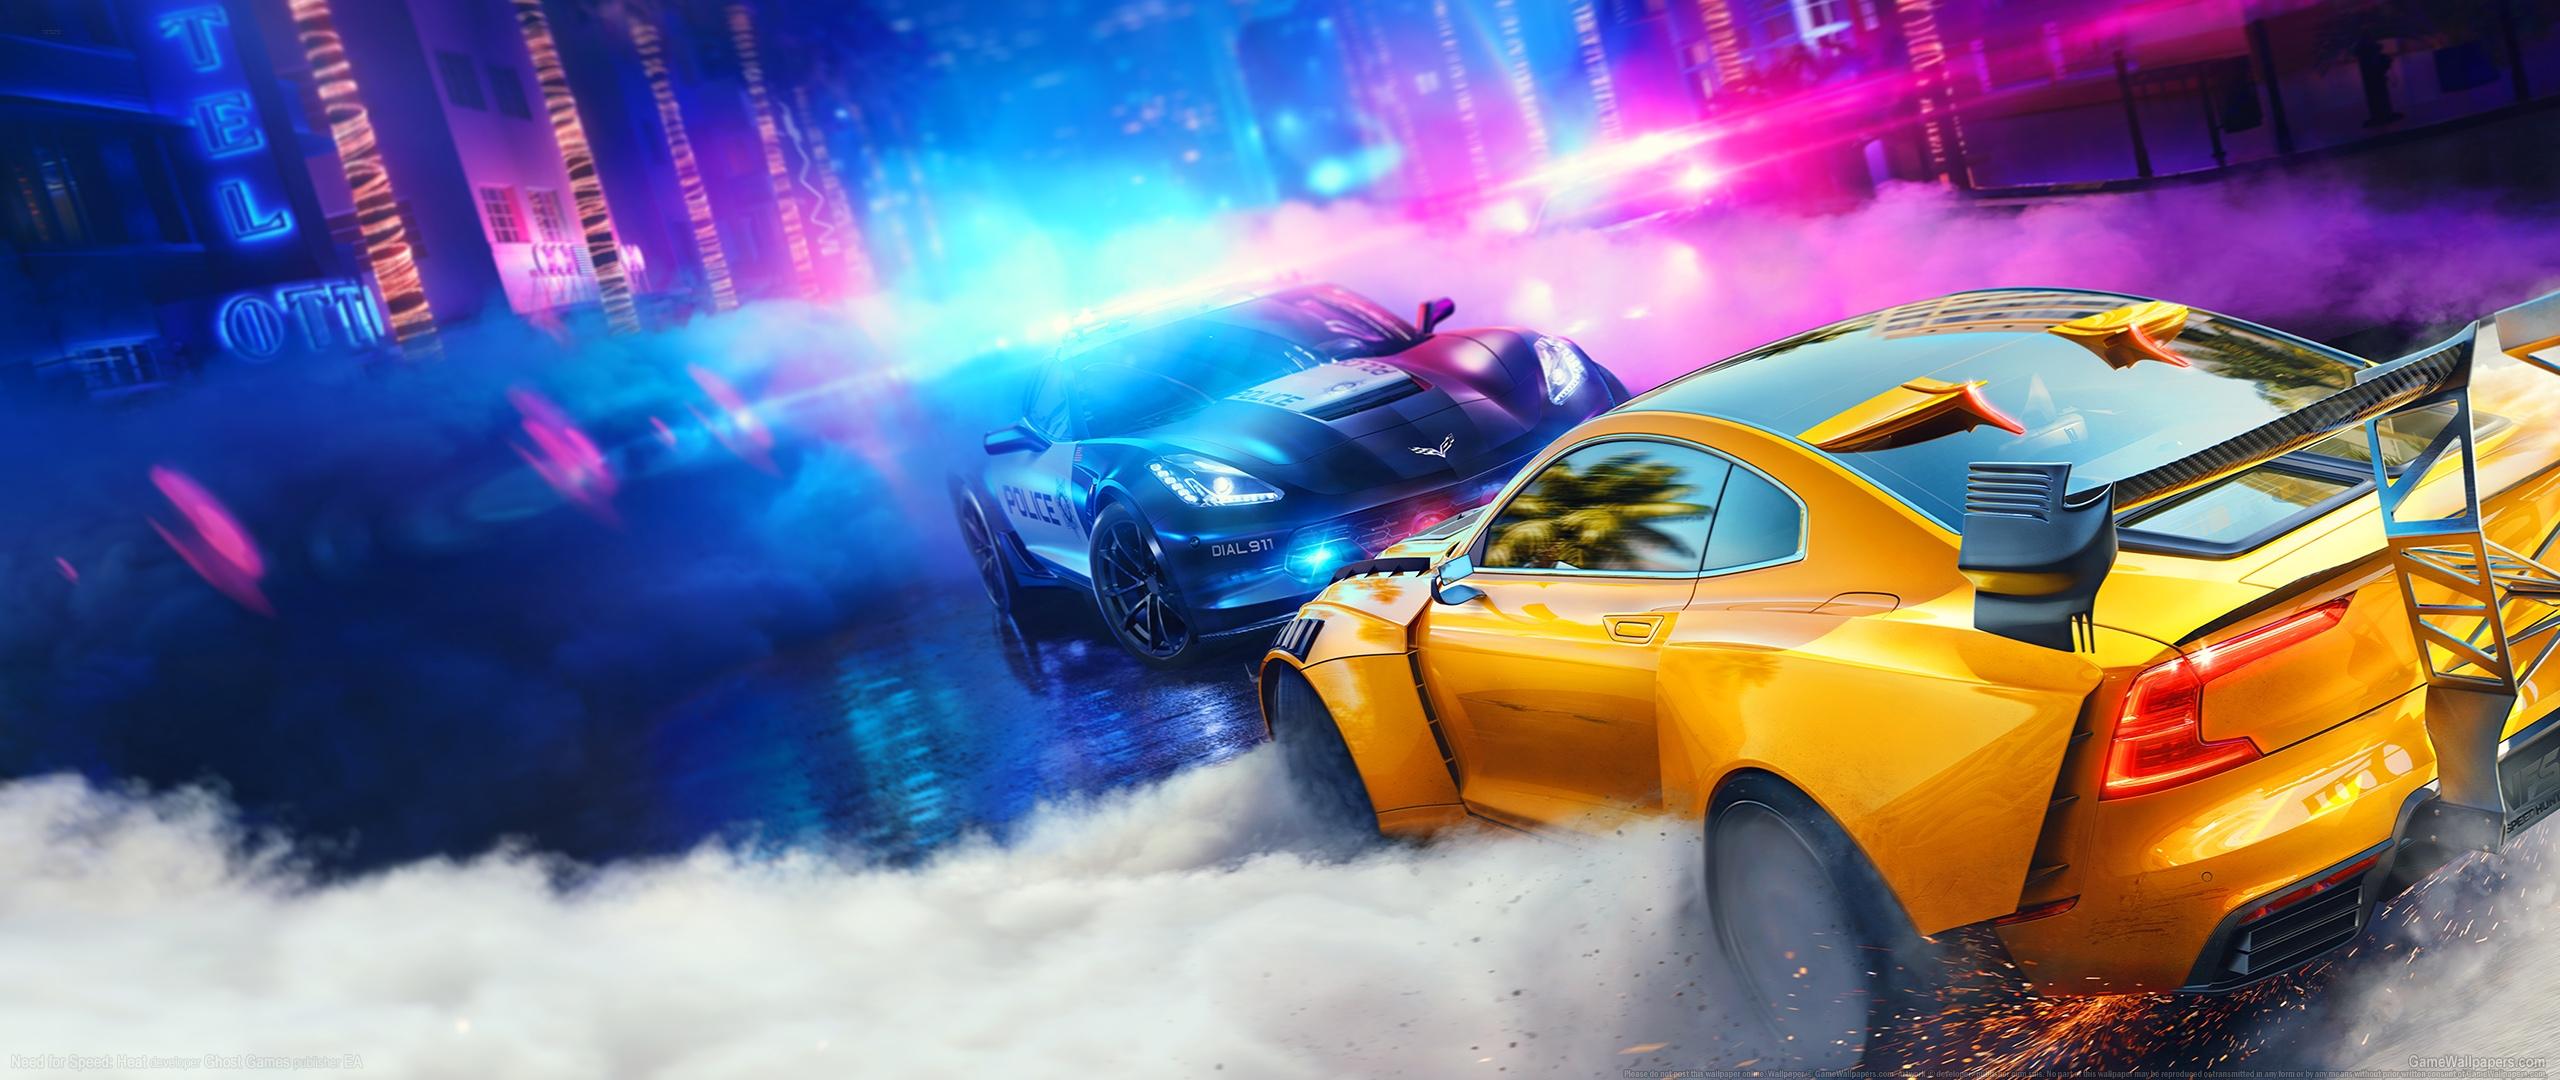 Need for Speed: Heat 2560x1080 fondo de escritorio 01